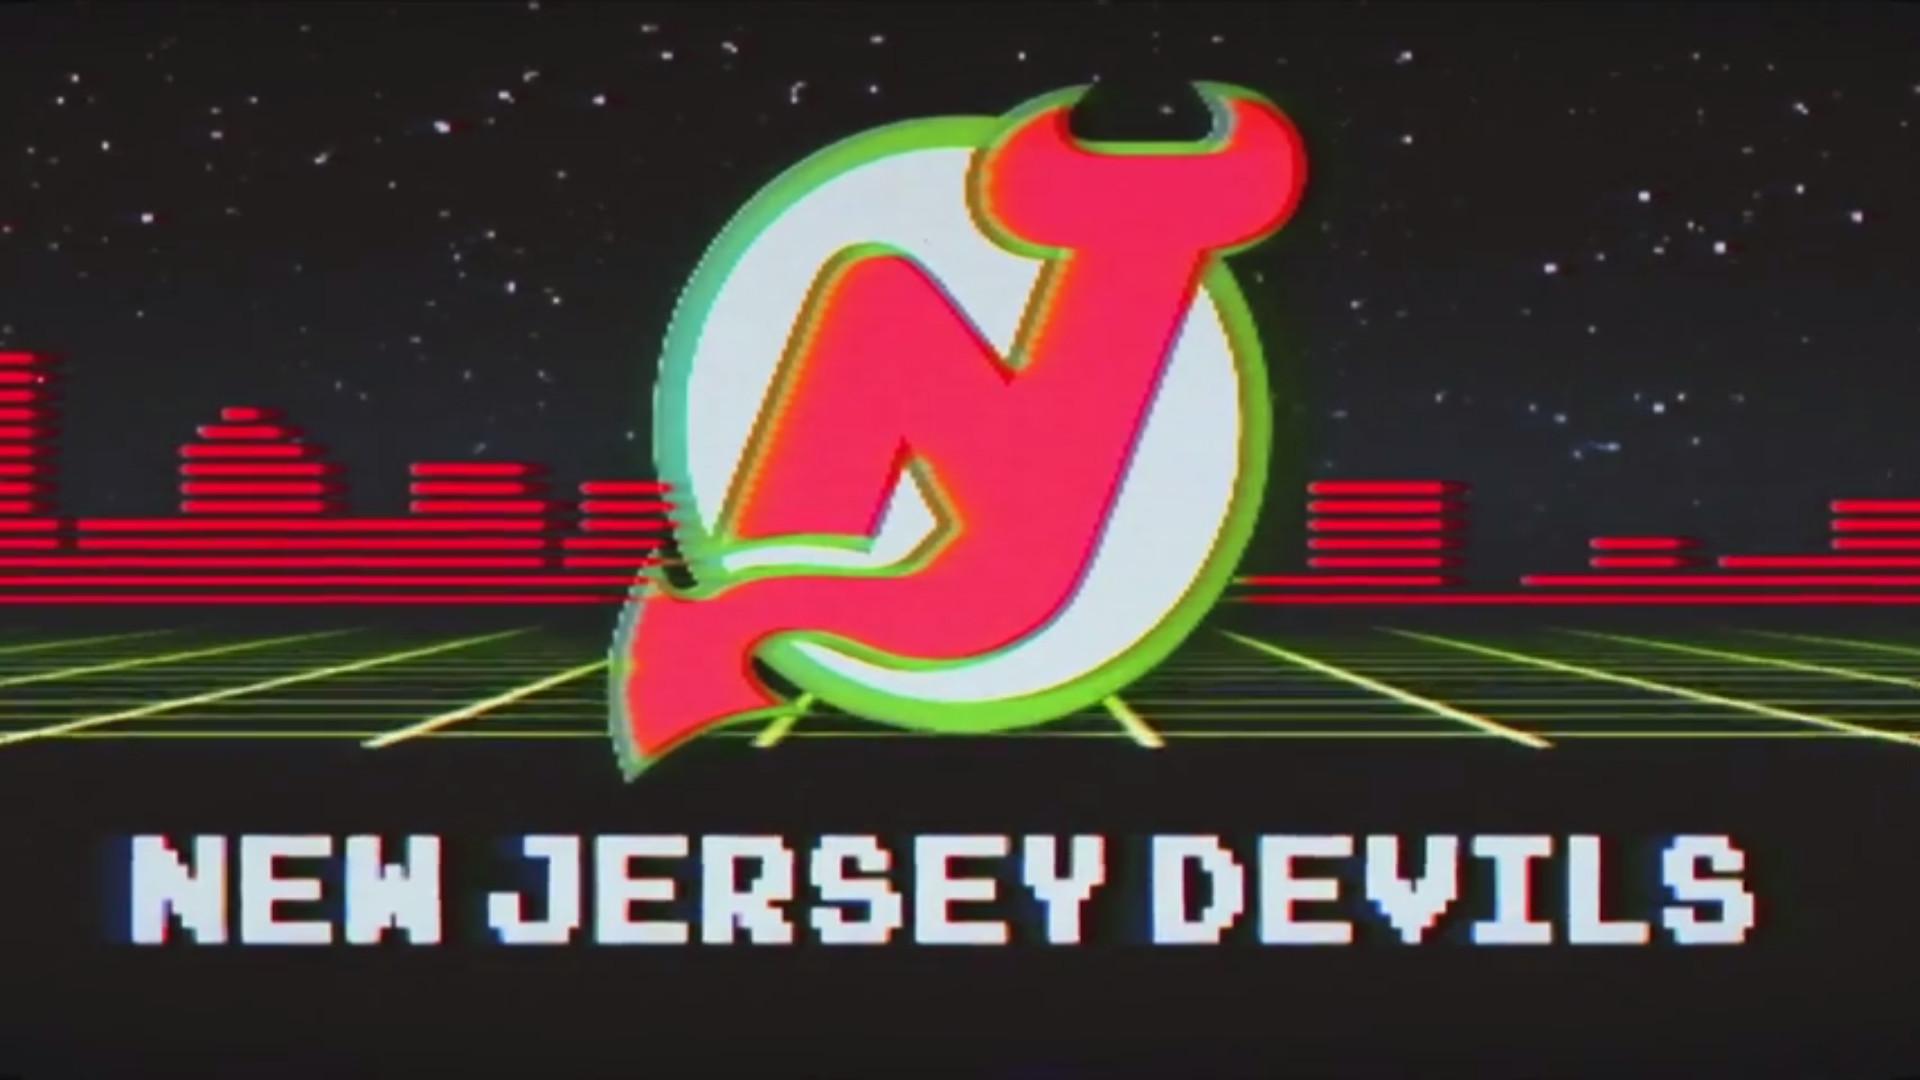 Here's a wallpaper-sized version of the retro Devils logo from the retro  night promo!